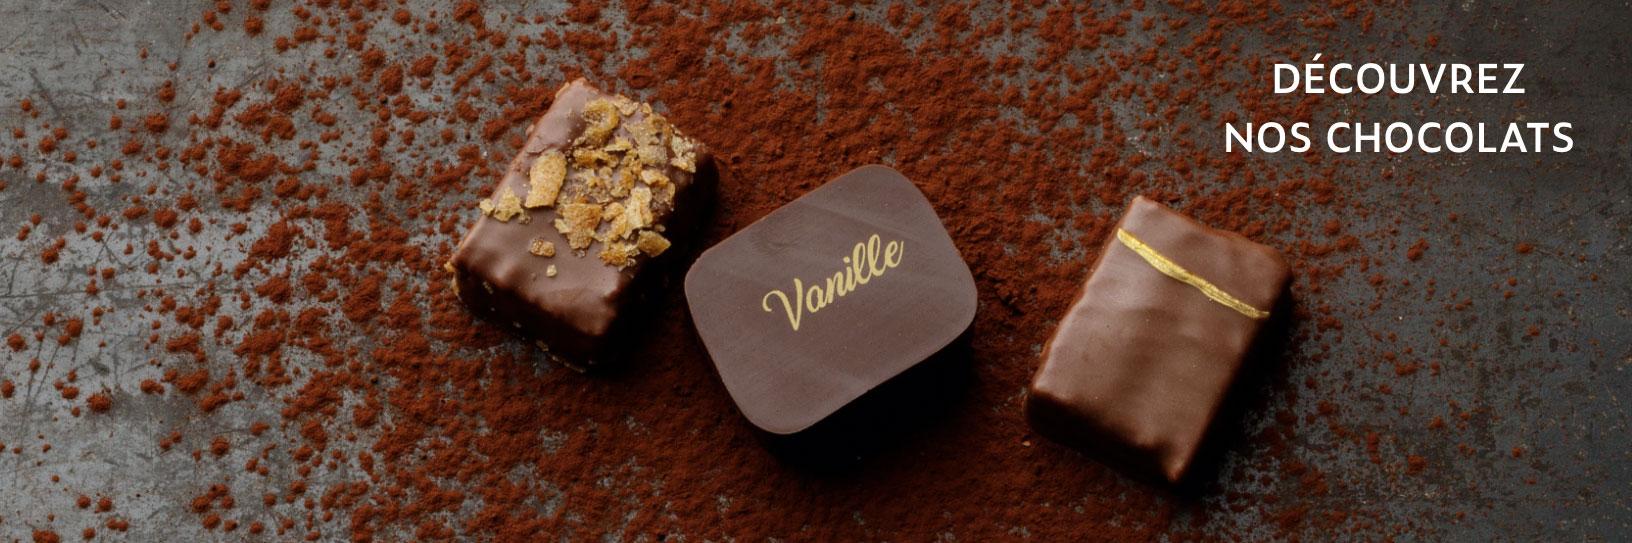 bandeau_chocolat